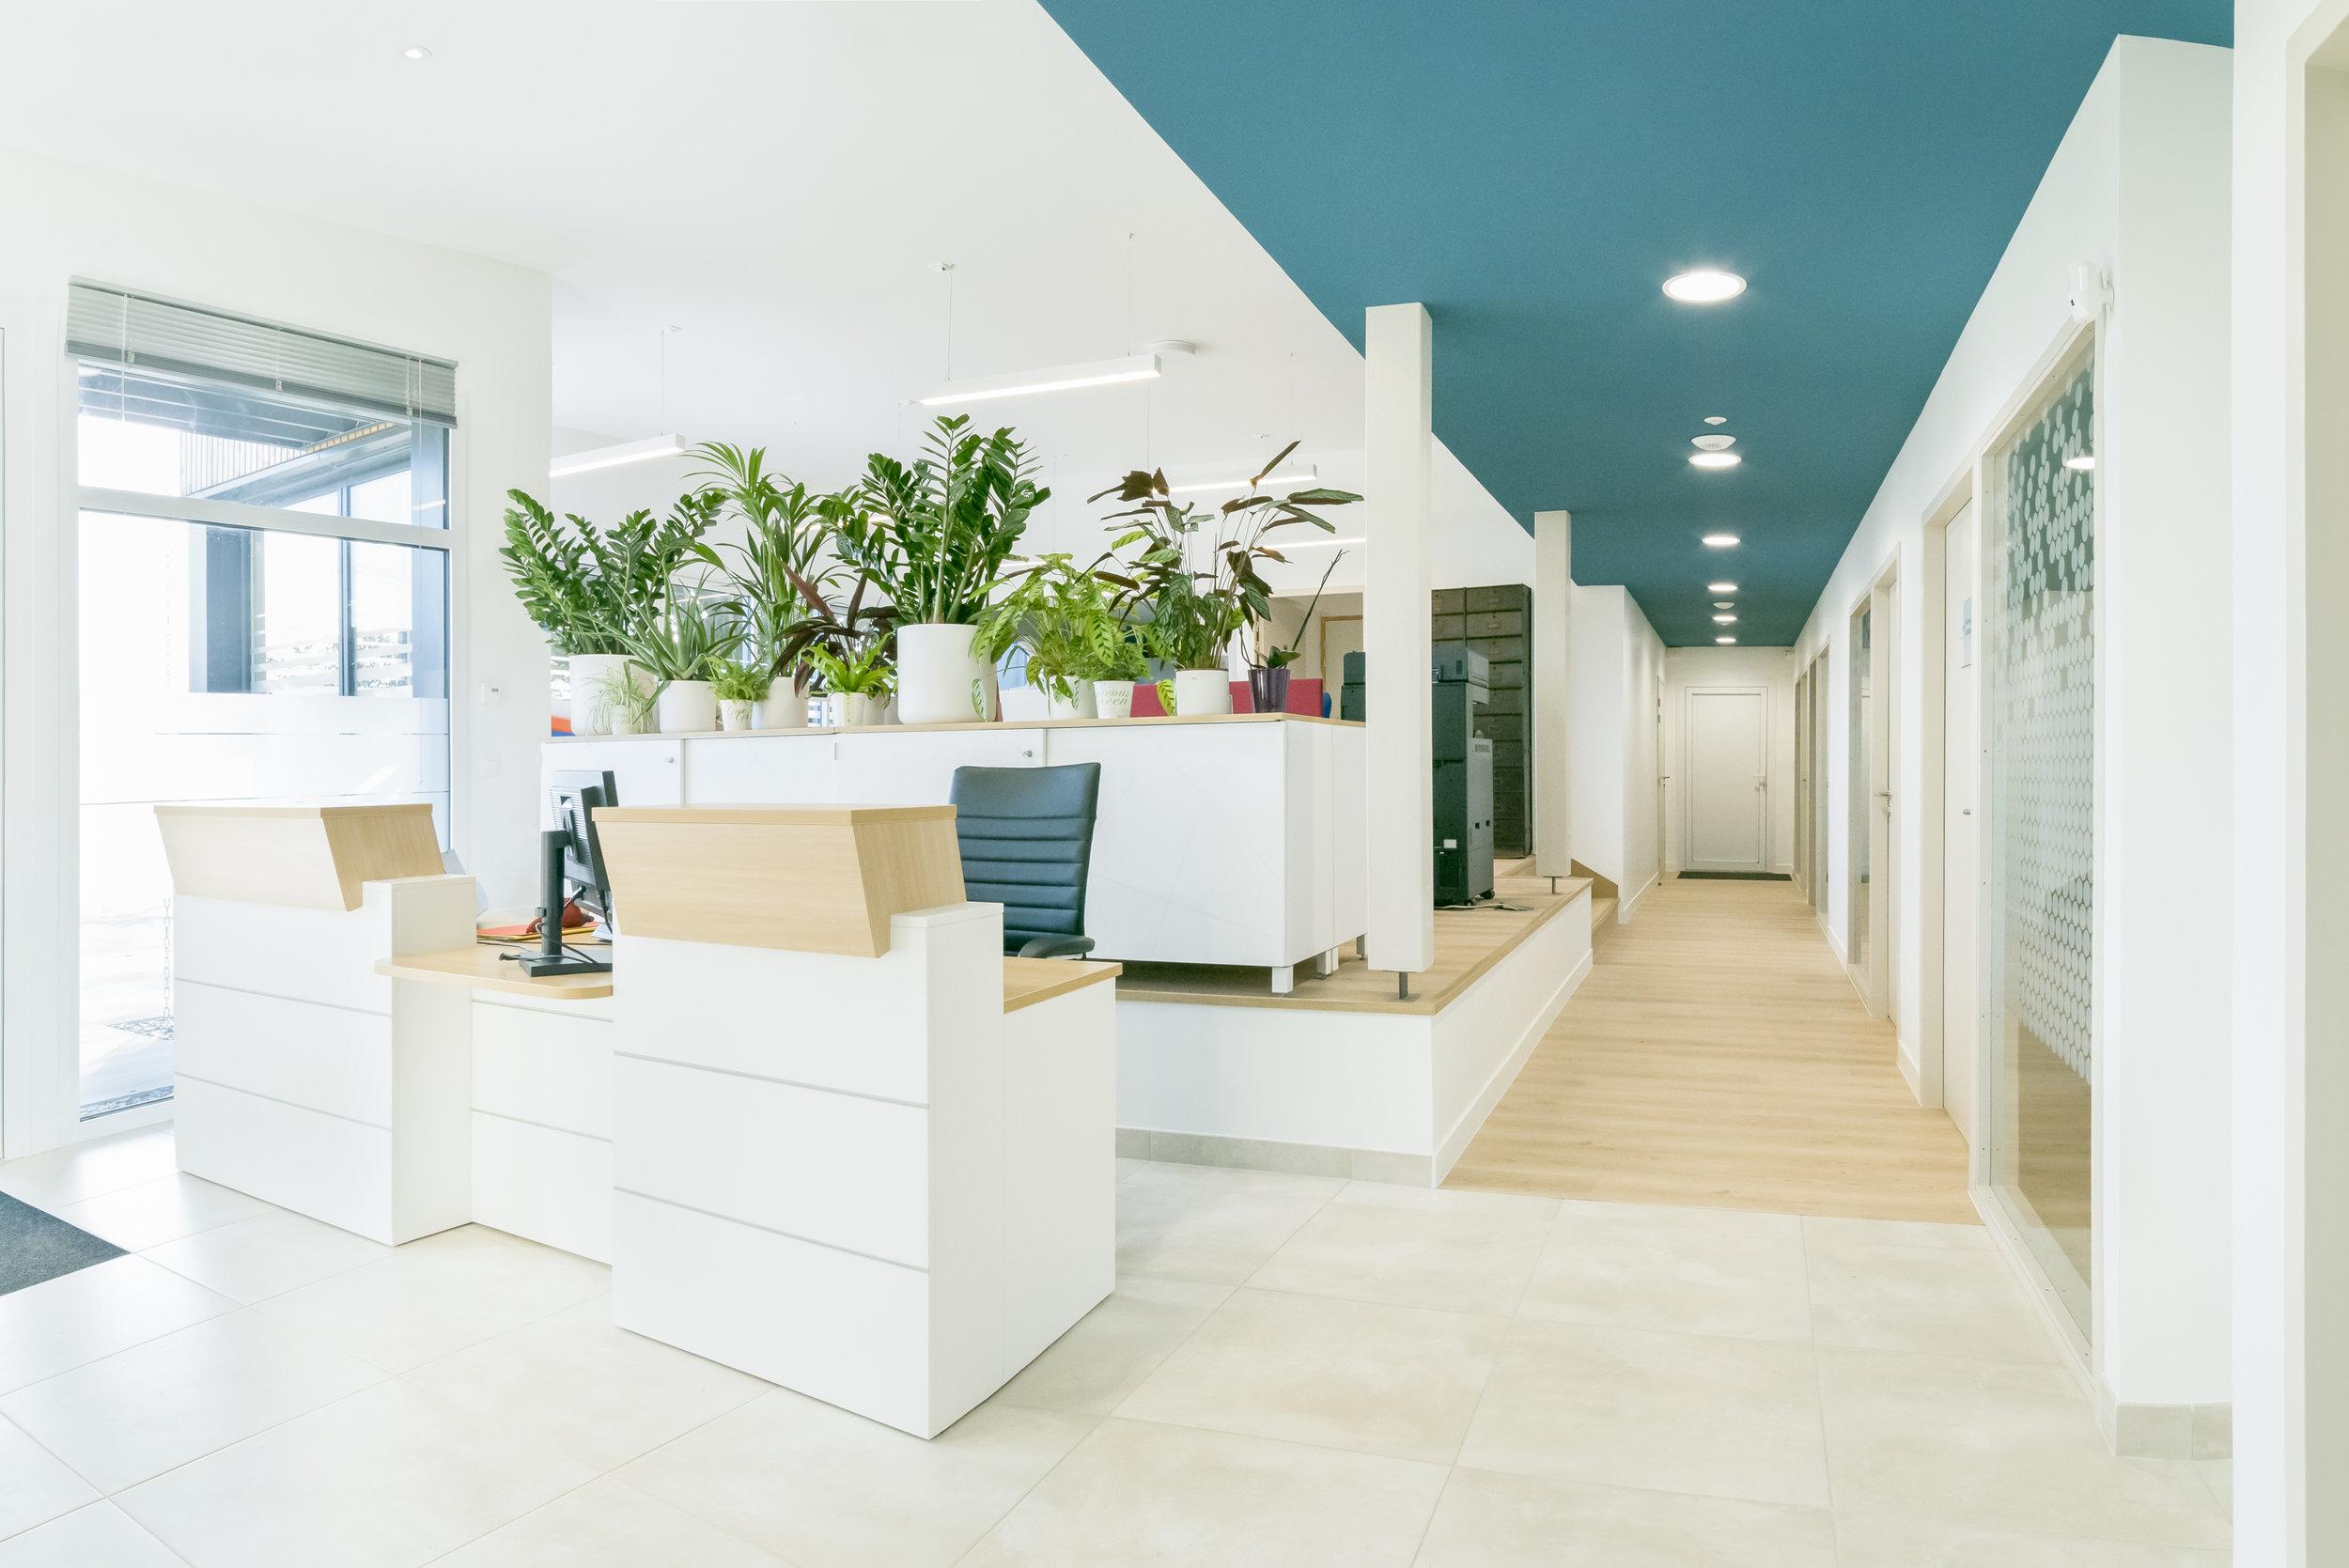 Office Notarial Guémené-Penfao Rennes (35) Maro Architectes construction 3.jpg